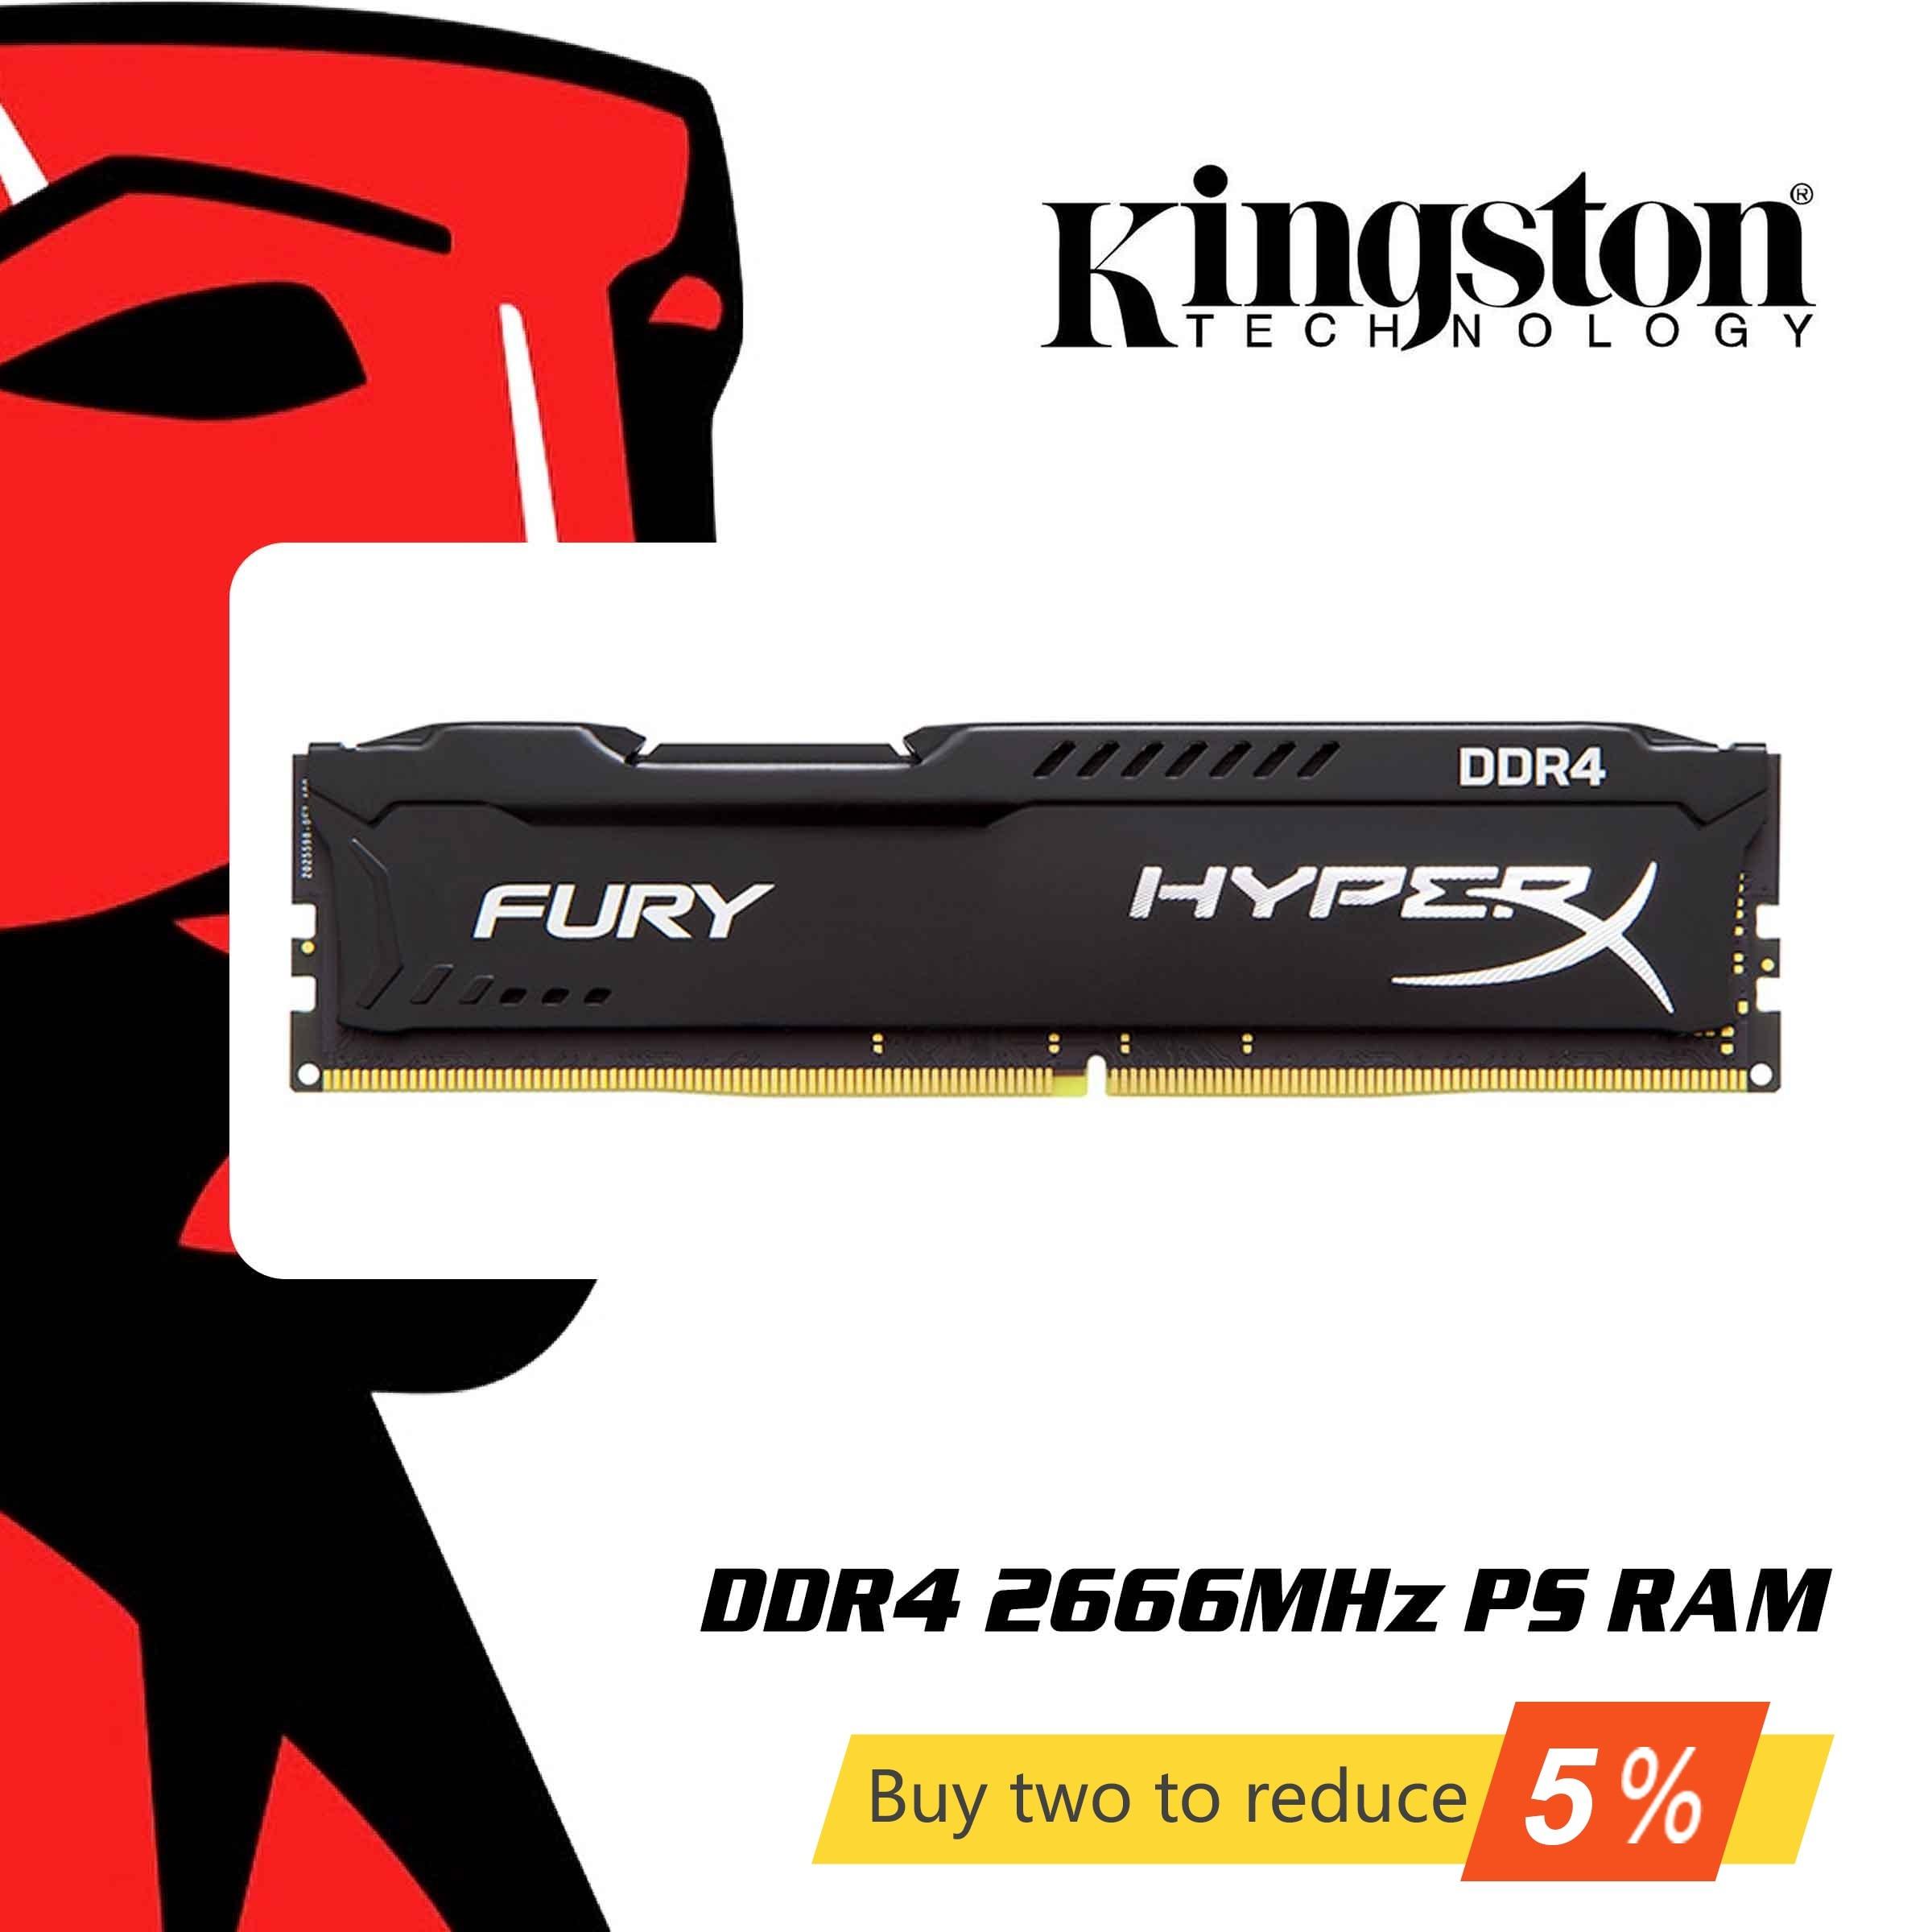 Original Kingston HyperX FURY 4GB 8GB 16GB Desktop Game RAM Memory DDR4 2666MHz CL15 DIMM 288-pin Internal Memoria For GamingOriginal Kingston HyperX FURY 4GB 8GB 16GB Desktop Game RAM Memory DDR4 2666MHz CL15 DIMM 288-pin Internal Memoria For Gaming